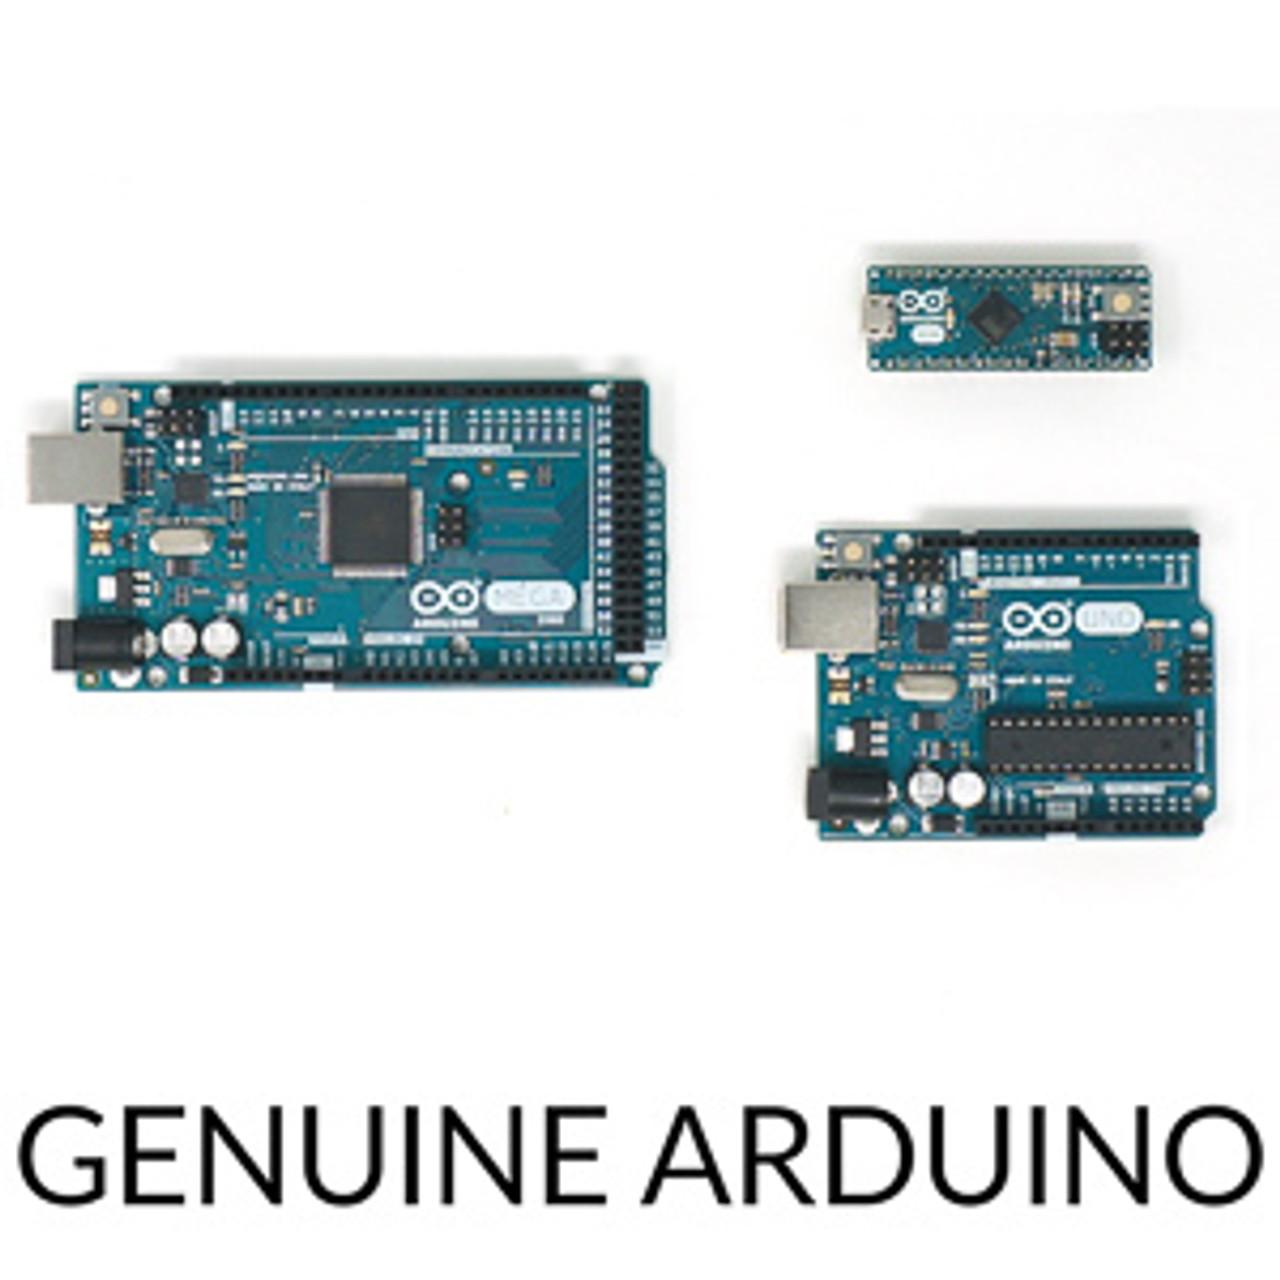 Official Arduino